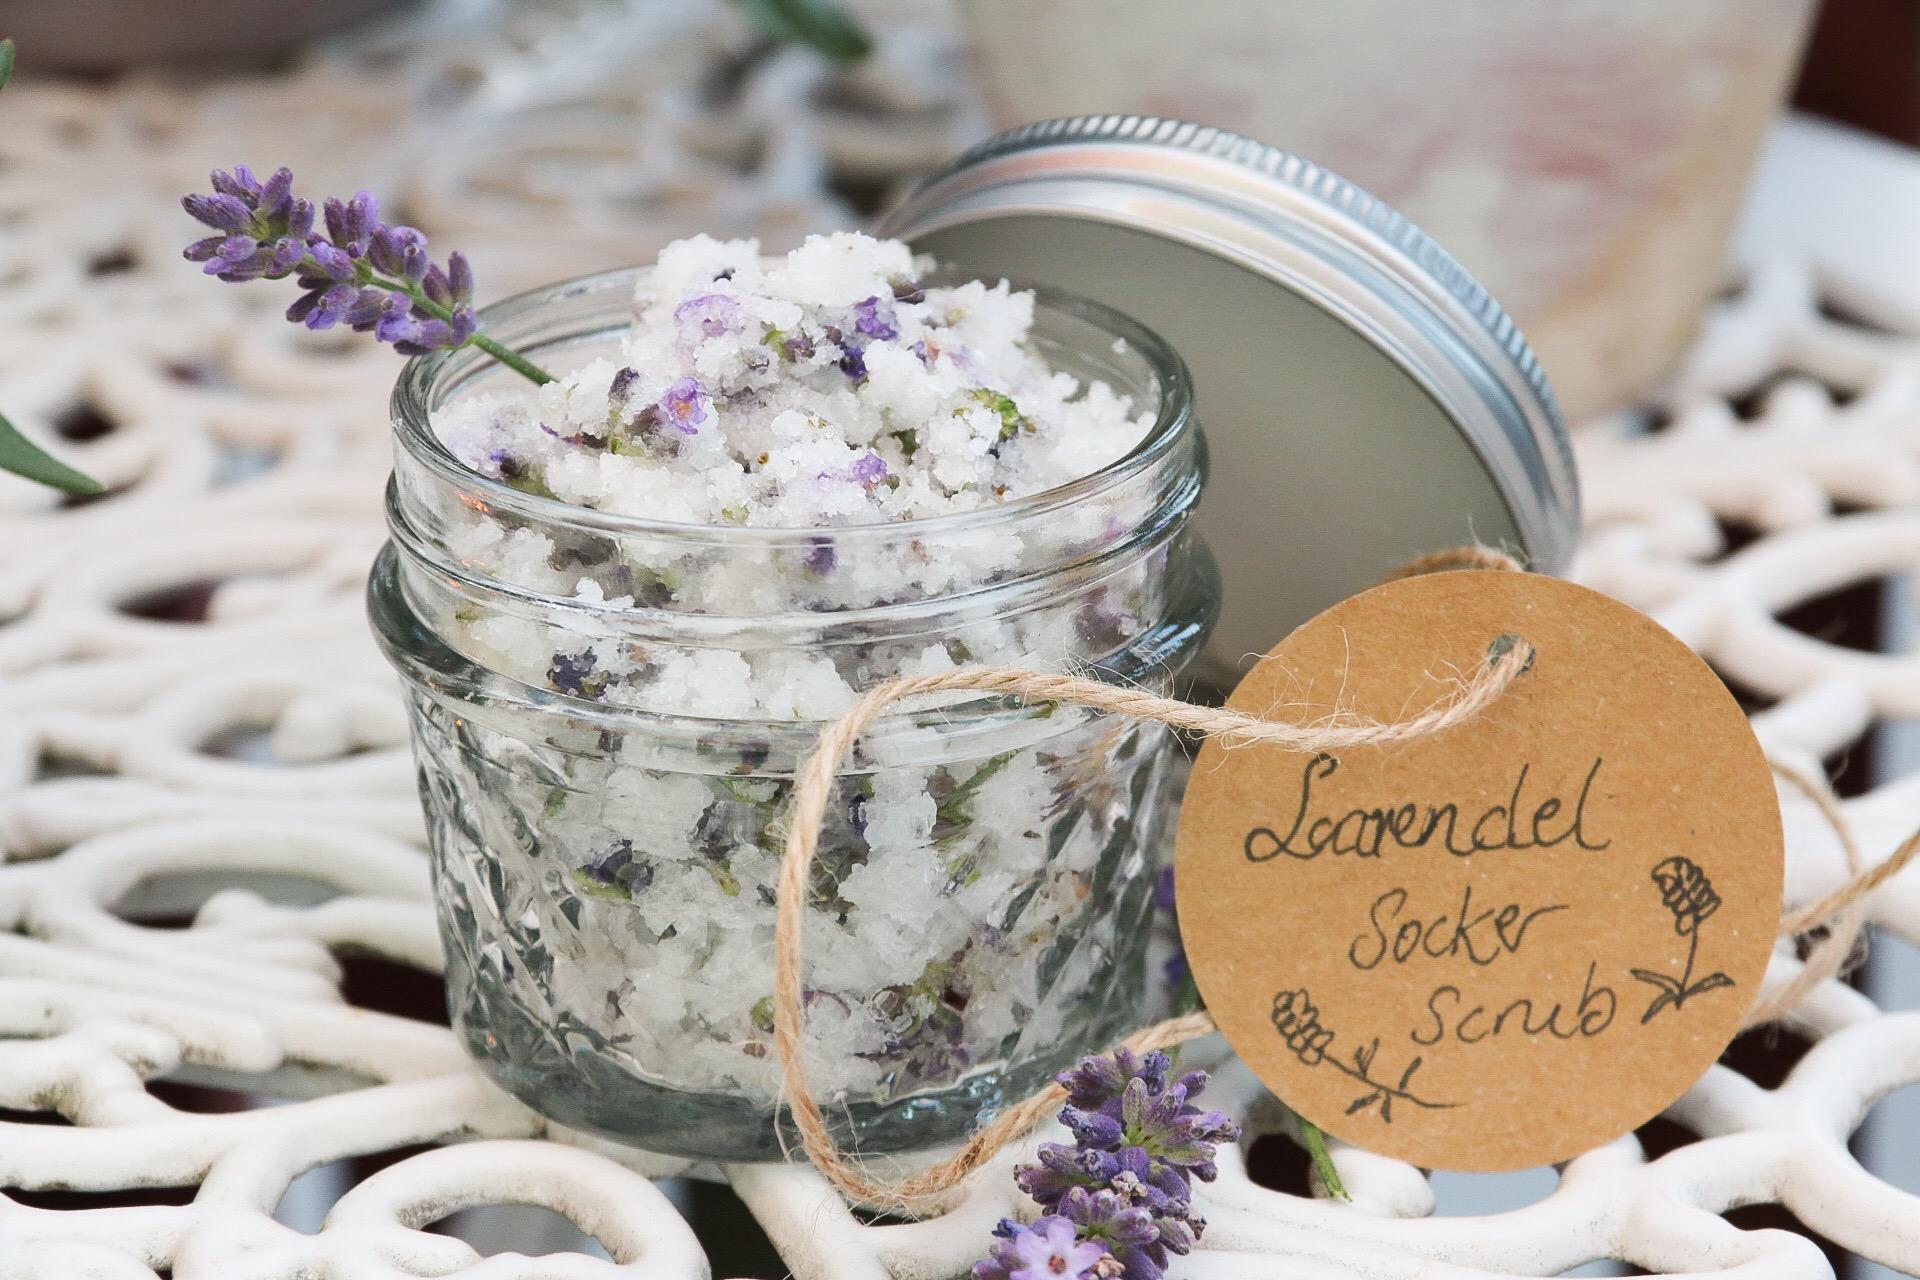 Lavendel sockerscrub